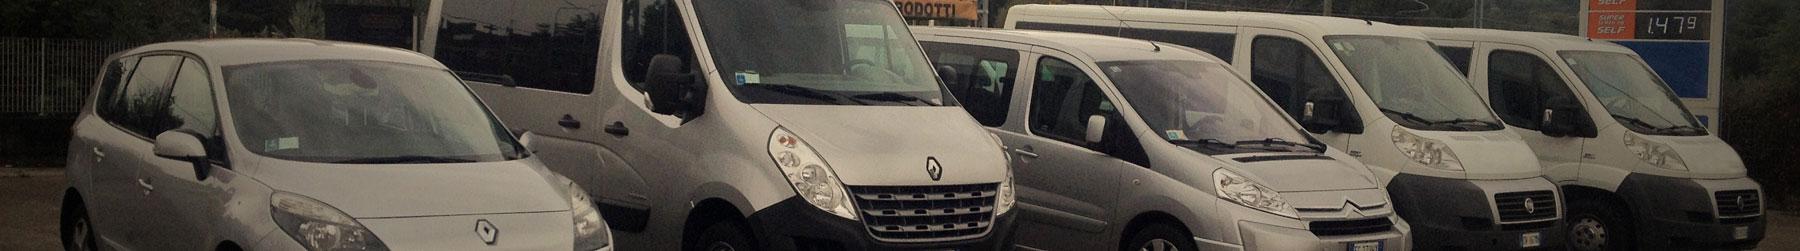 Flotta Piceno Car Sharing